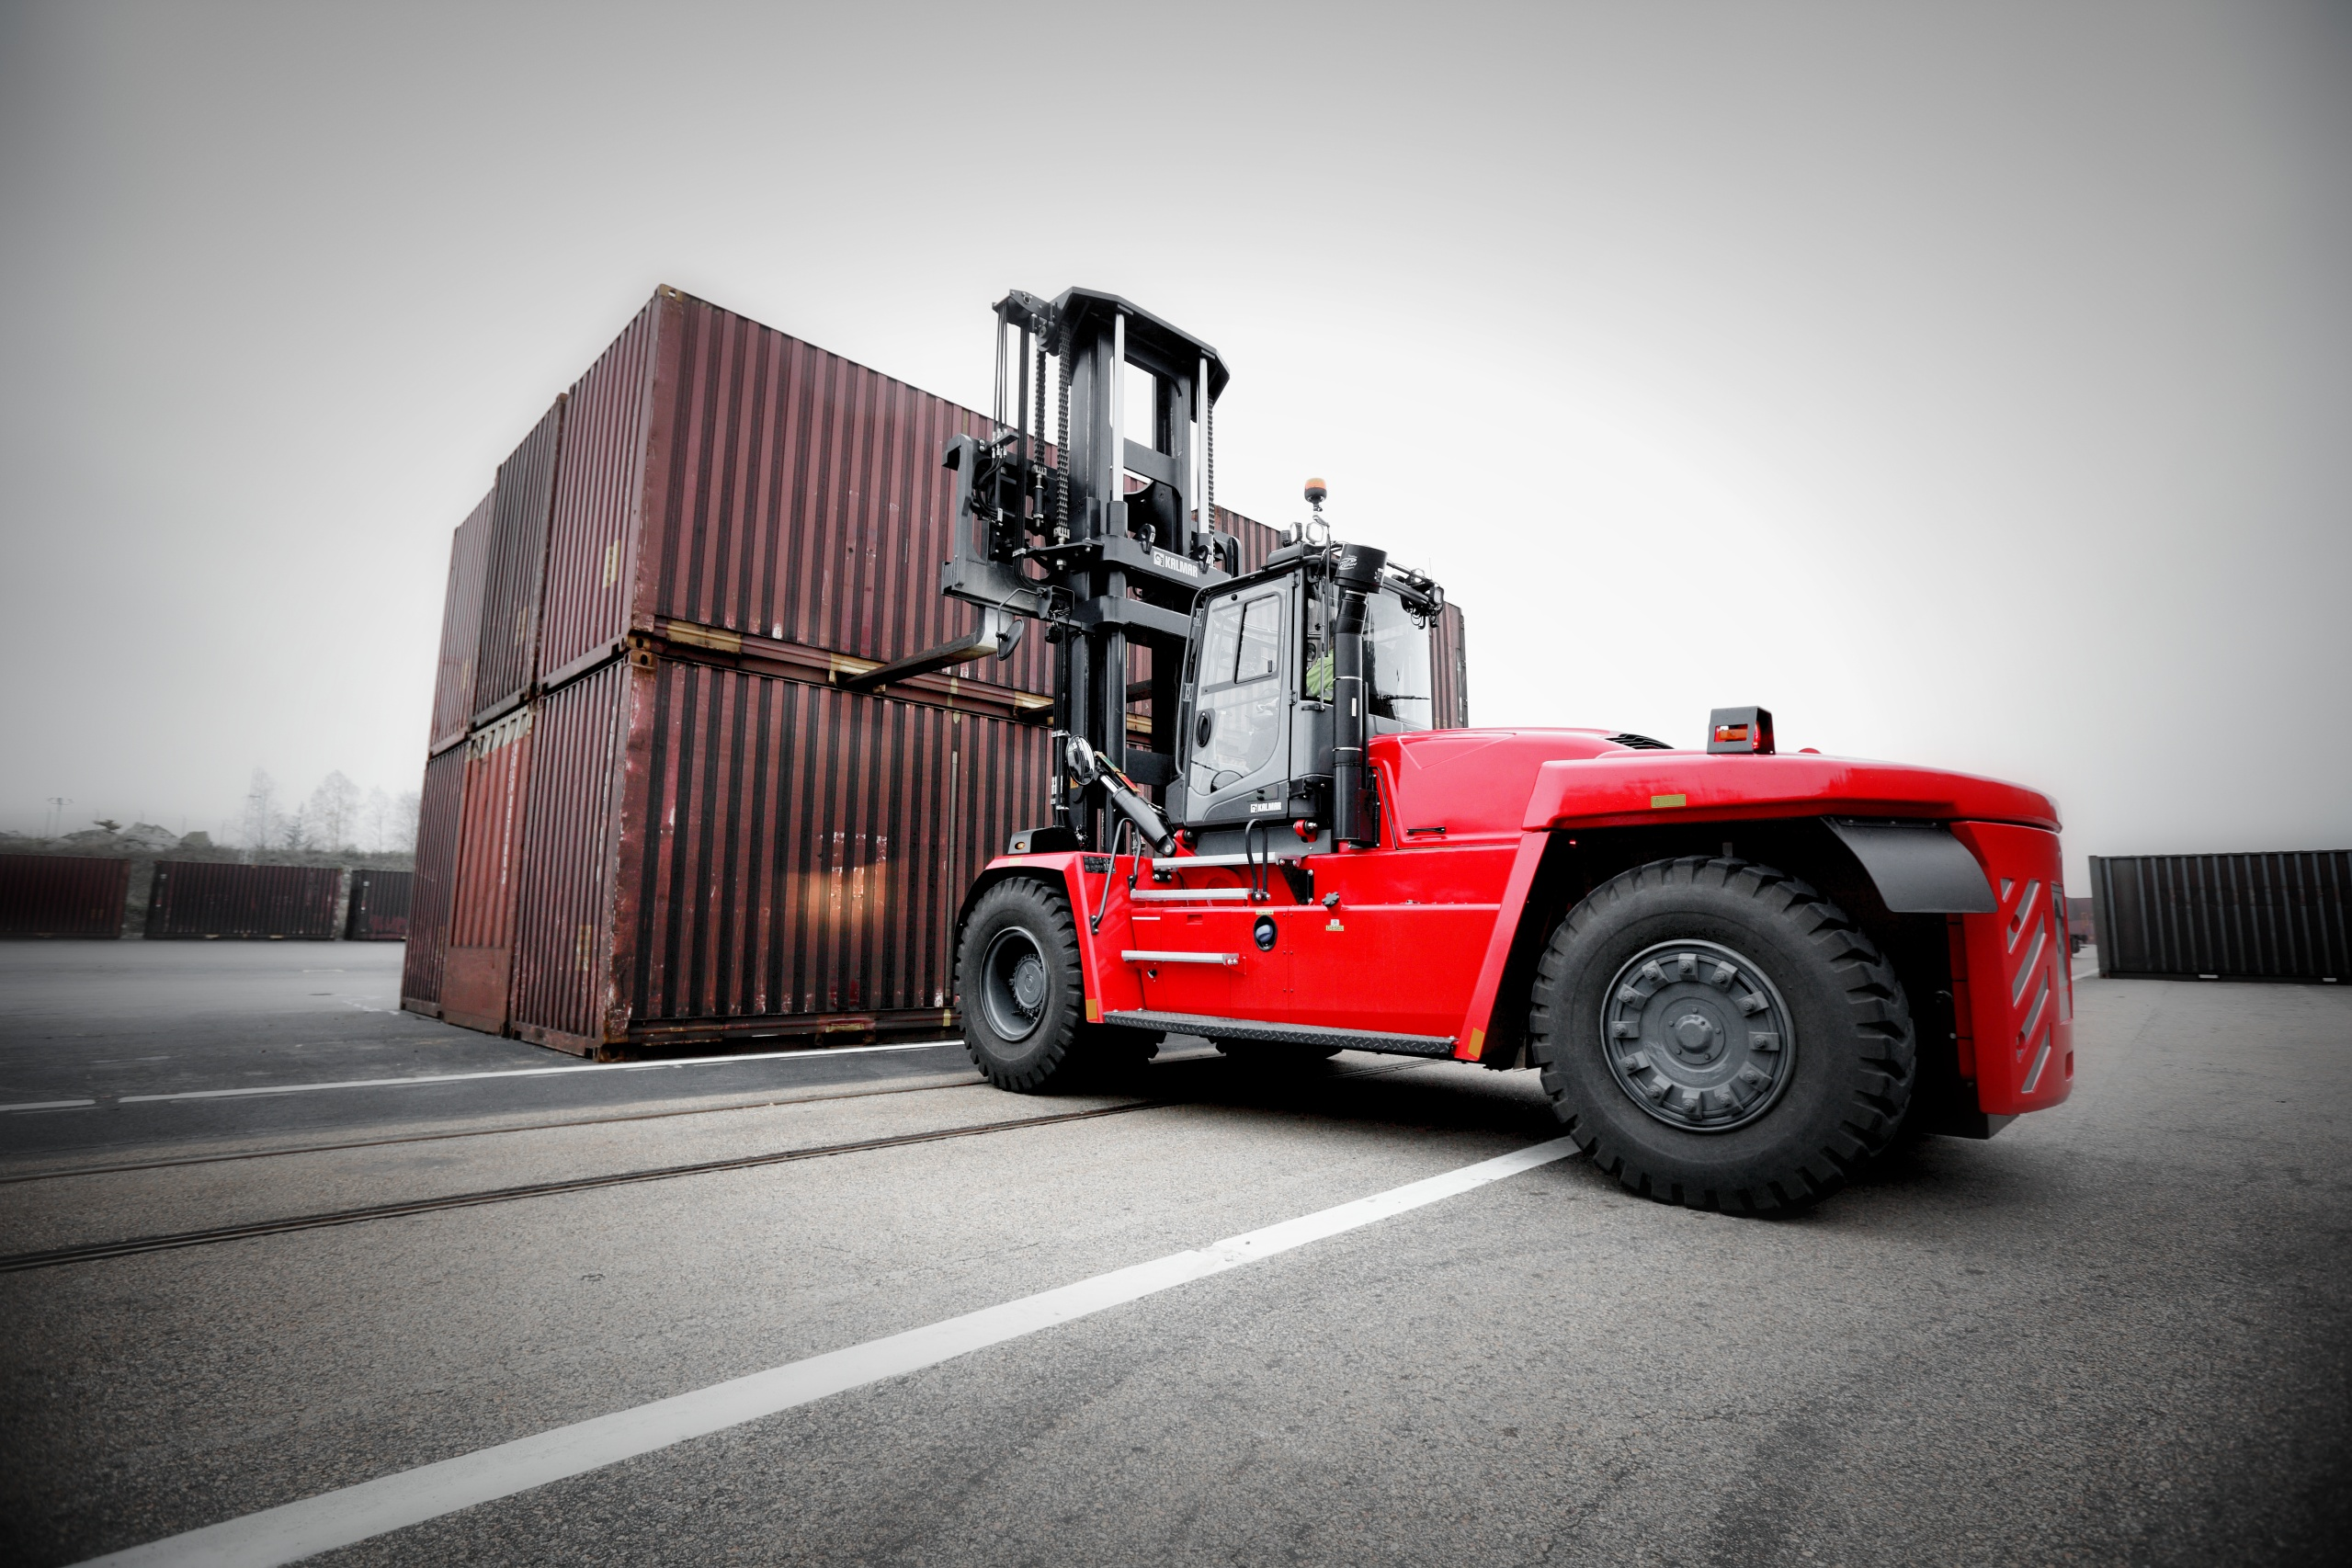 medium resolution of forklift trucks 18 52 ton kalmarglobal toyota forklift wiring diagram pdf forklift trucks 18 52 ton